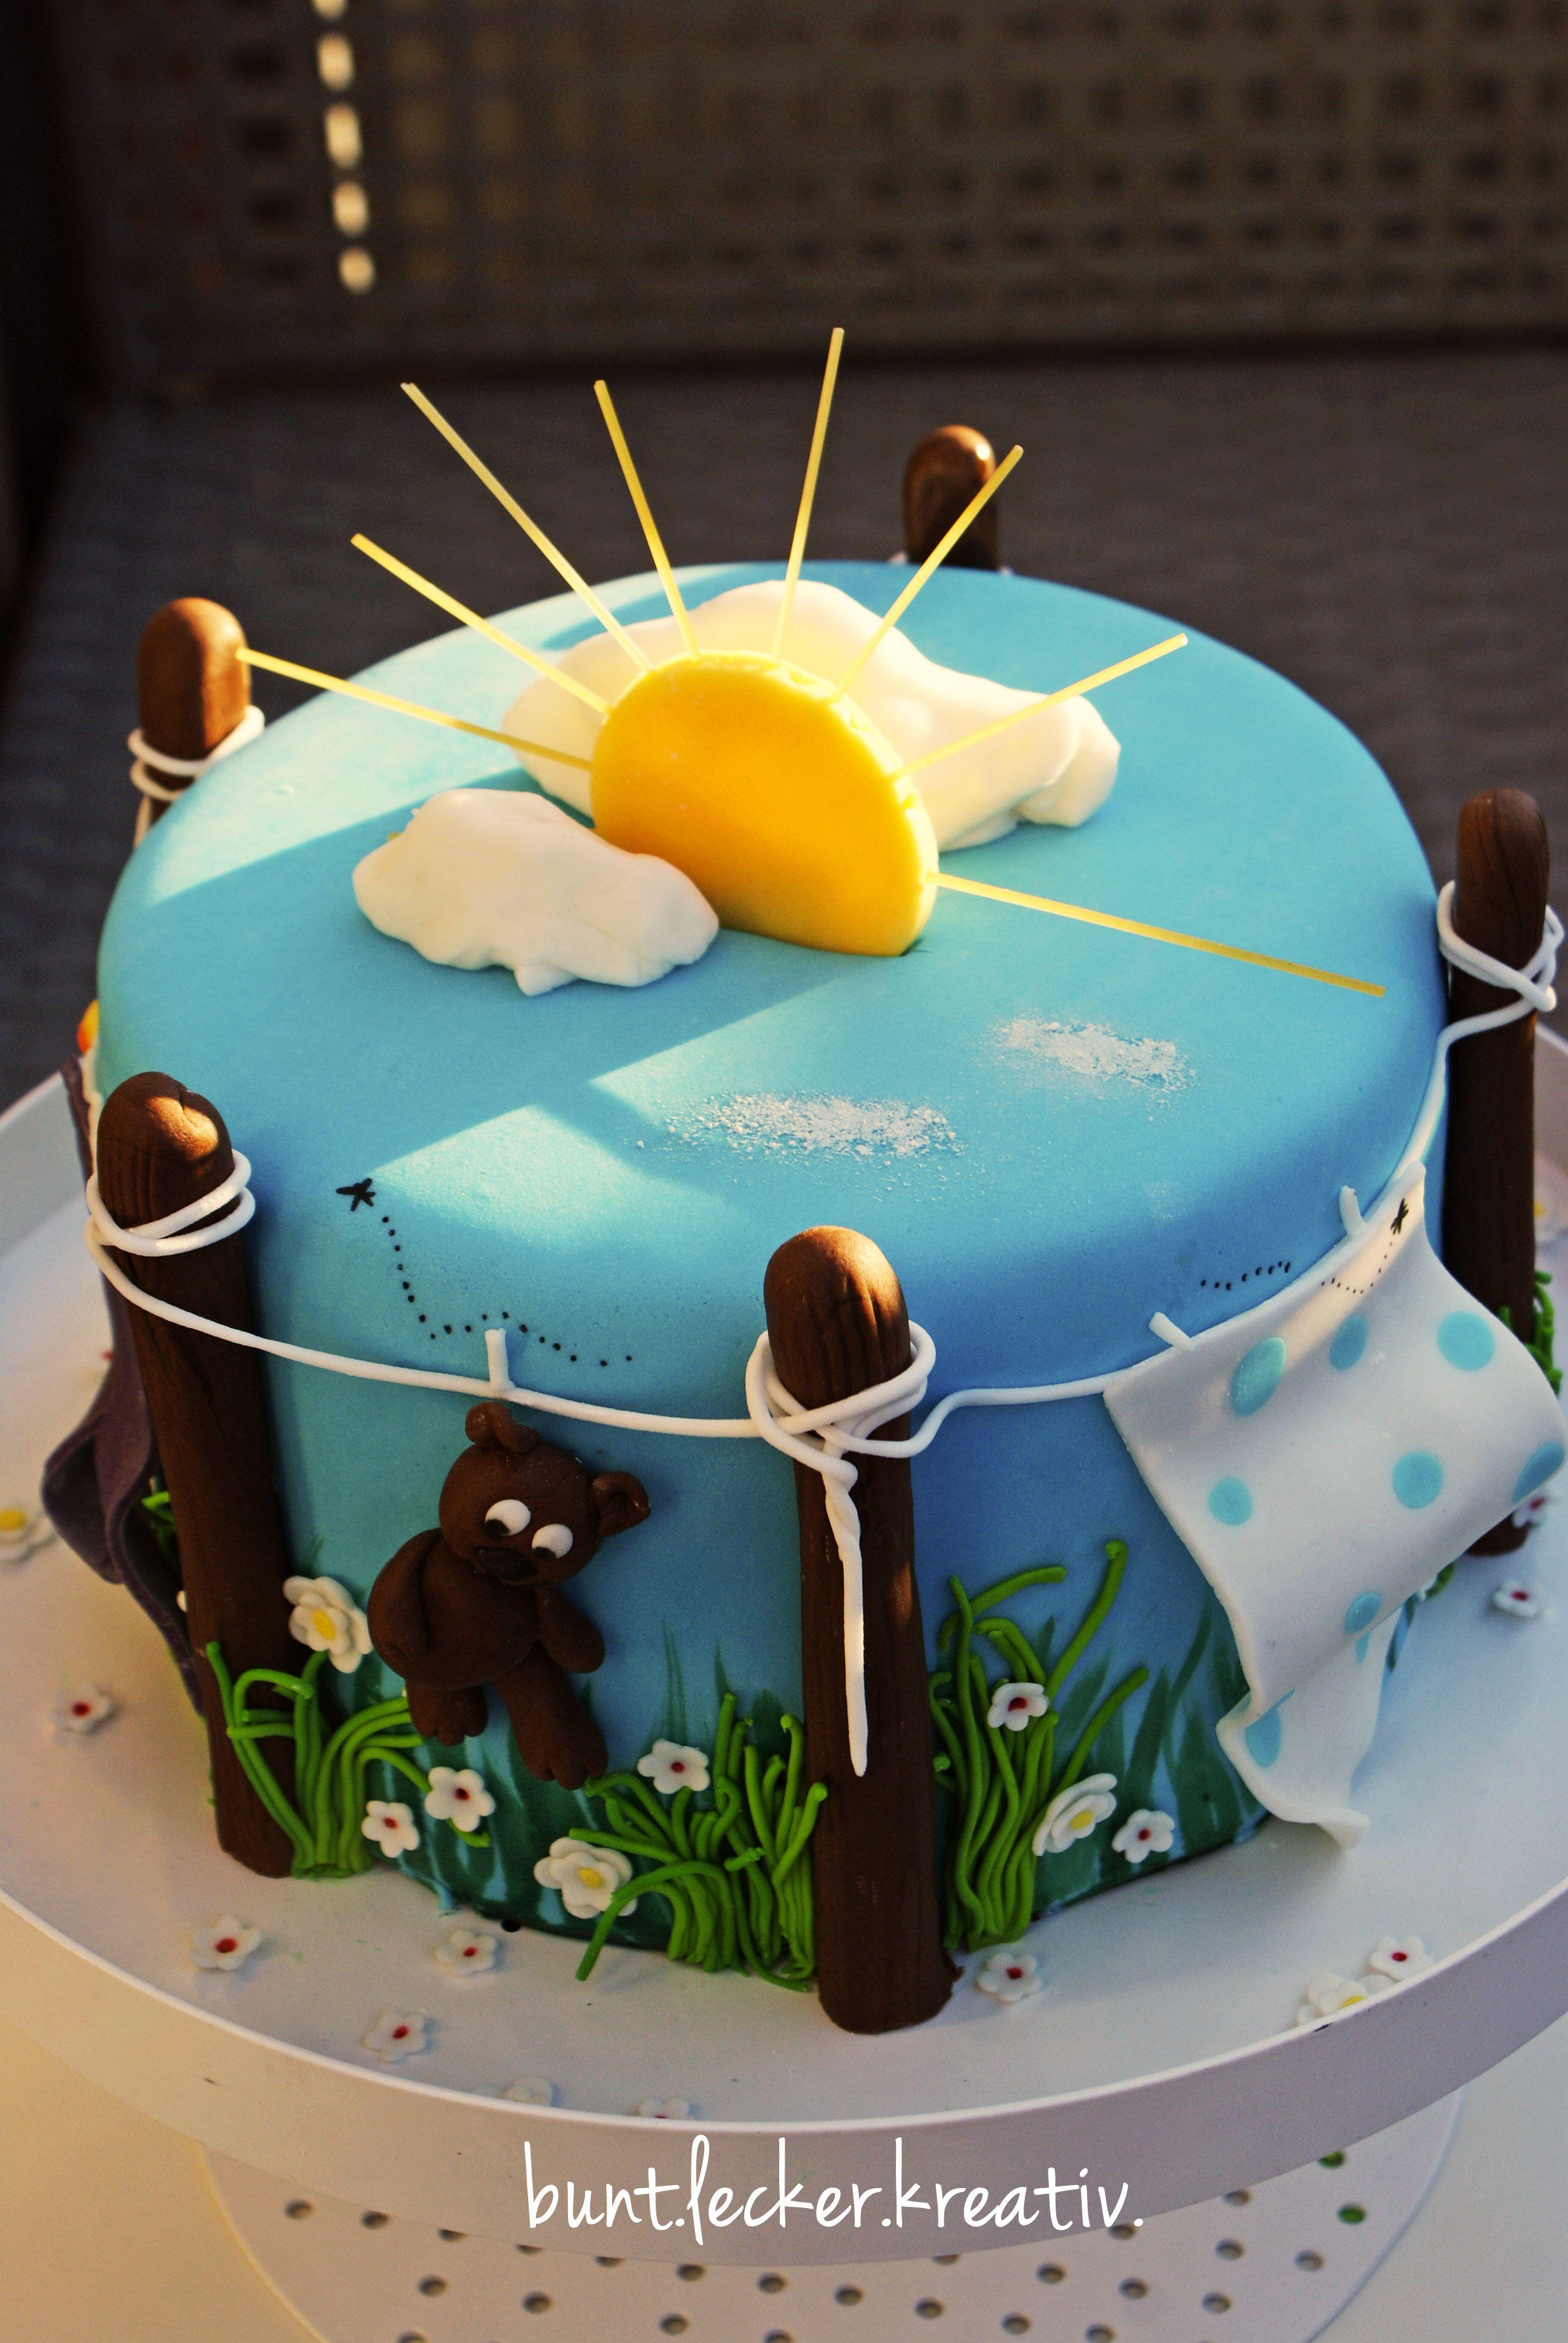 Flohmarkttorte Leckere Torten Kreative Kuchen Kuchen Ideen